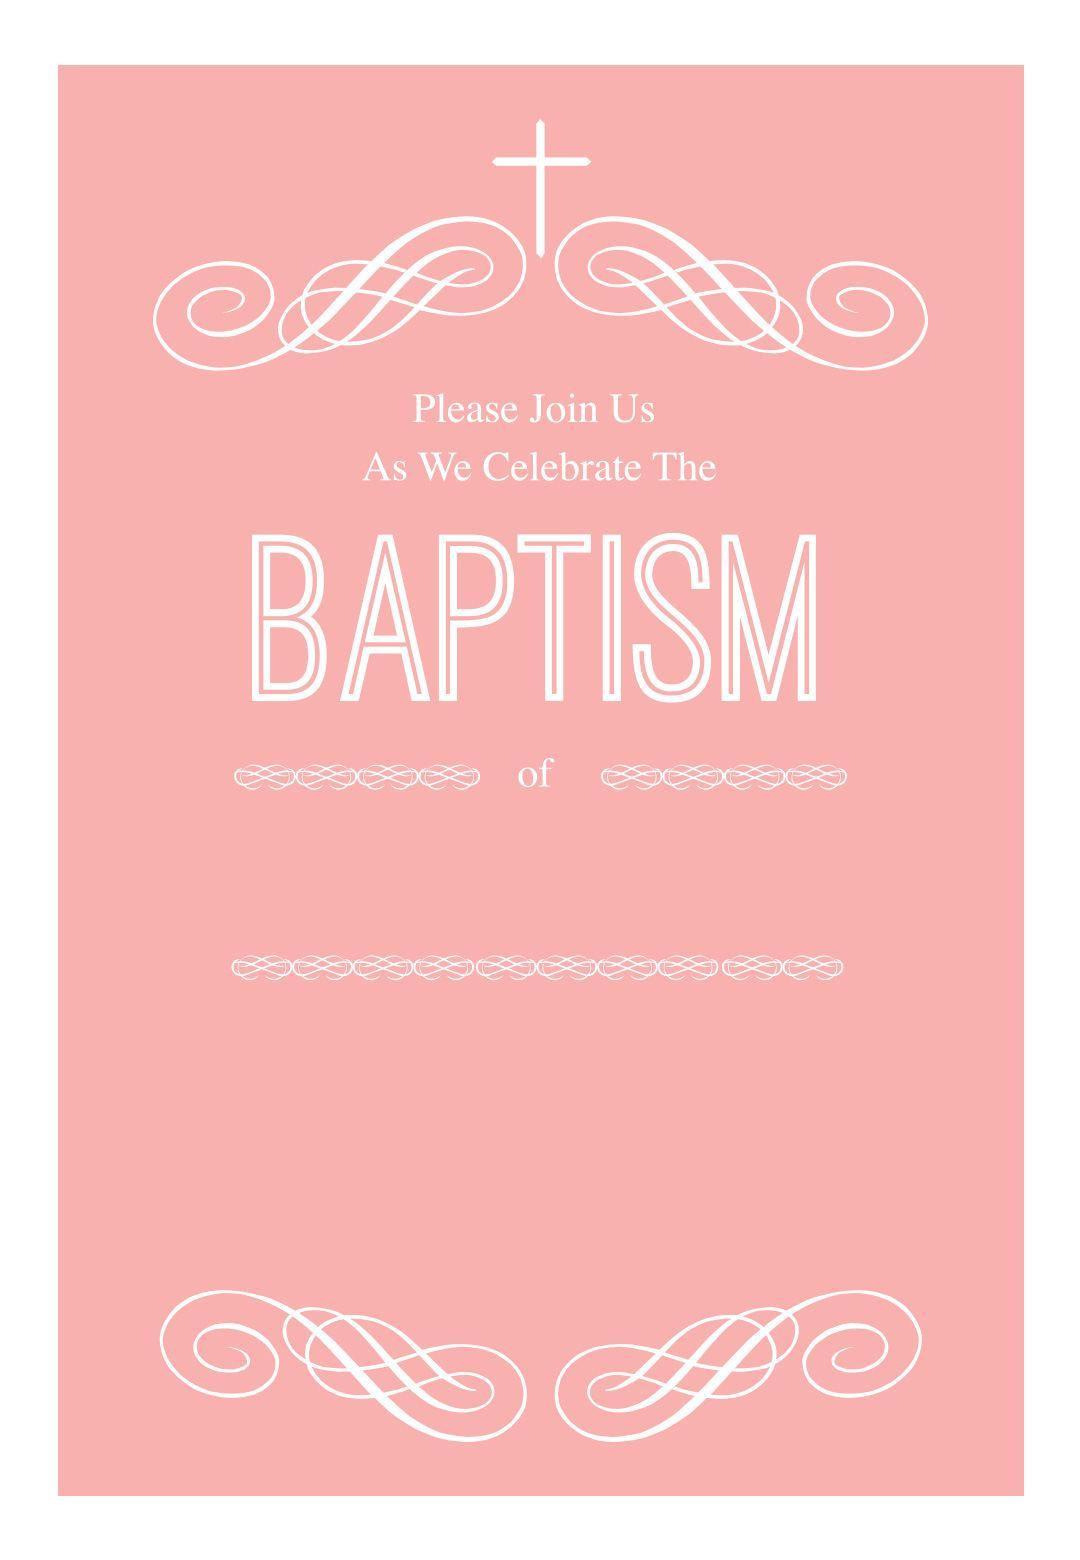 Pink Decorations - Free Printable Baptism & Christening Invitation - Free Printable Baptism Greeting Cards